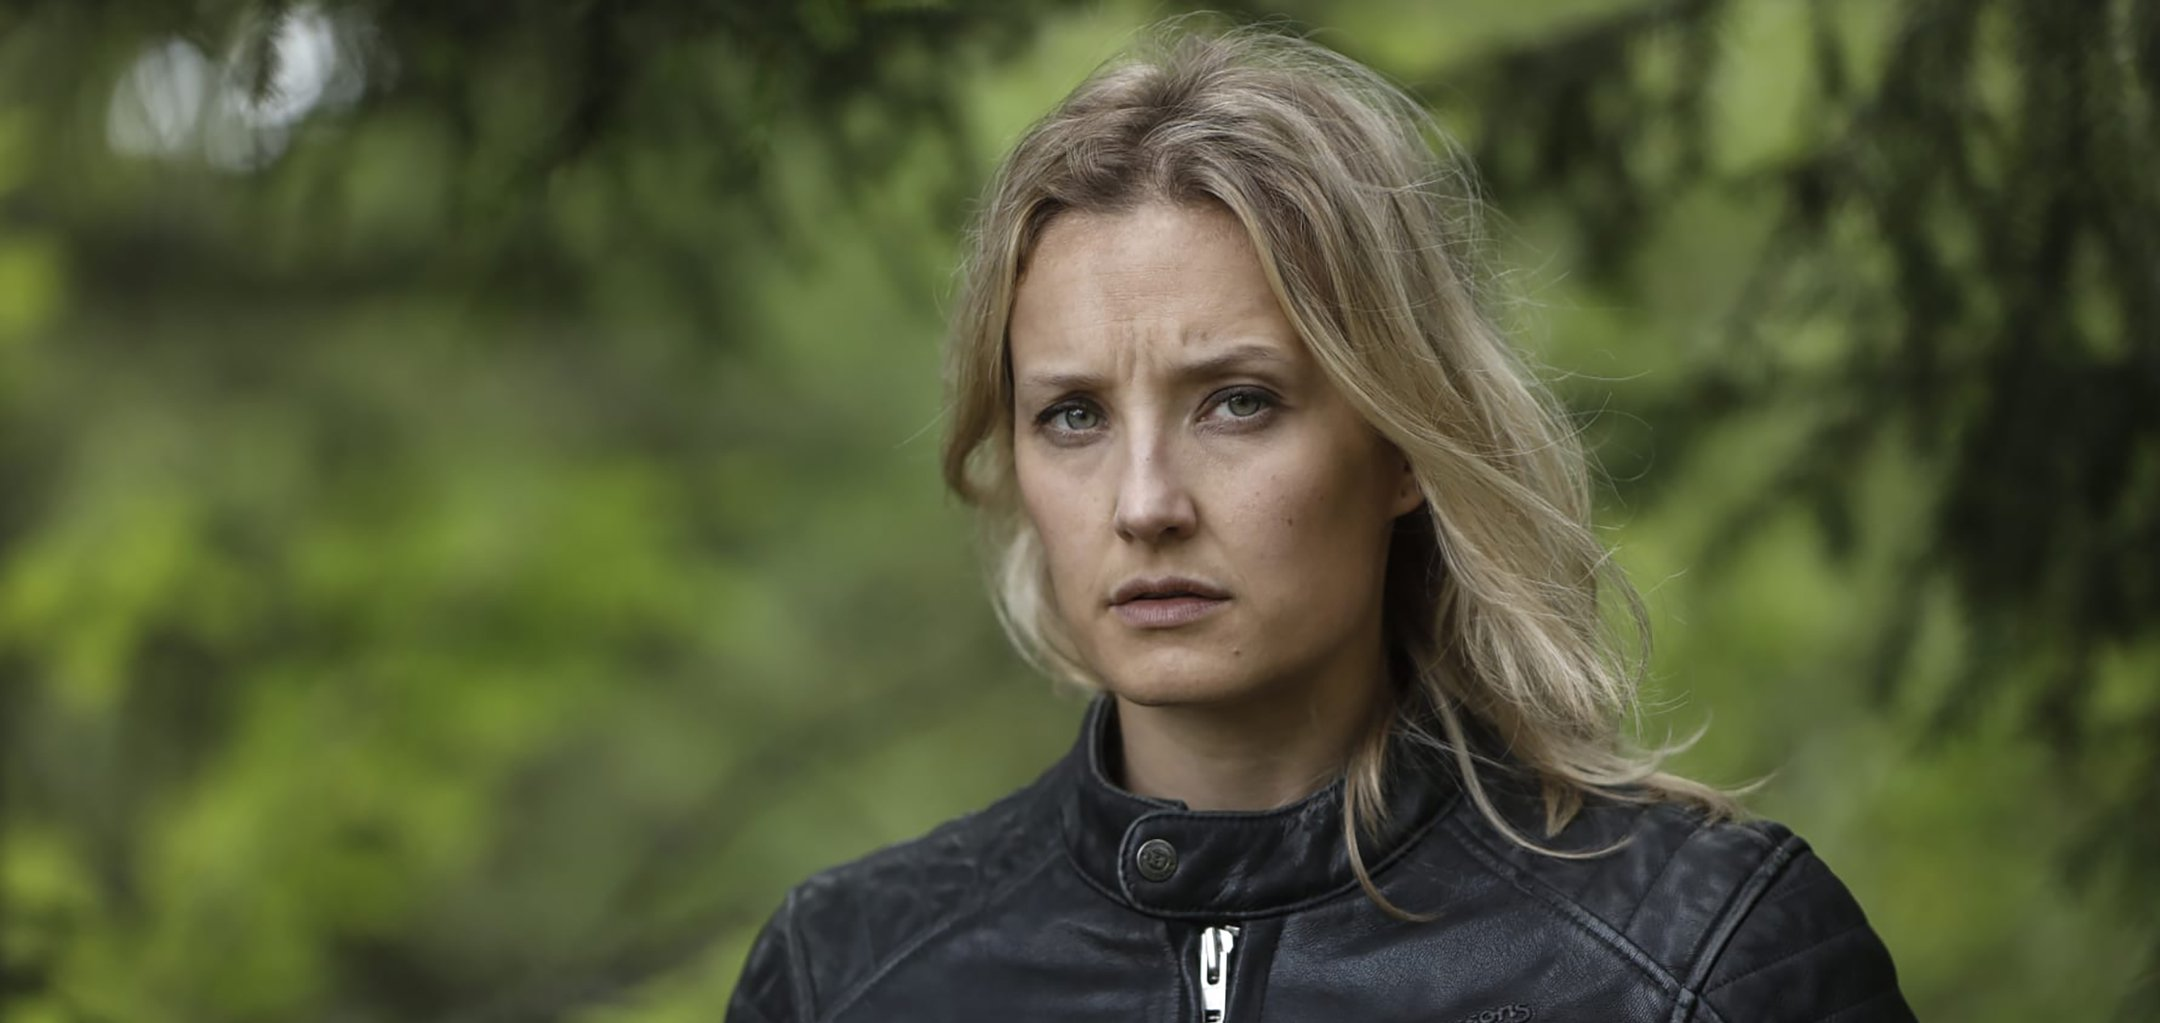 Ine Marie Wilmann in 'Furia' (2021) Keshet International